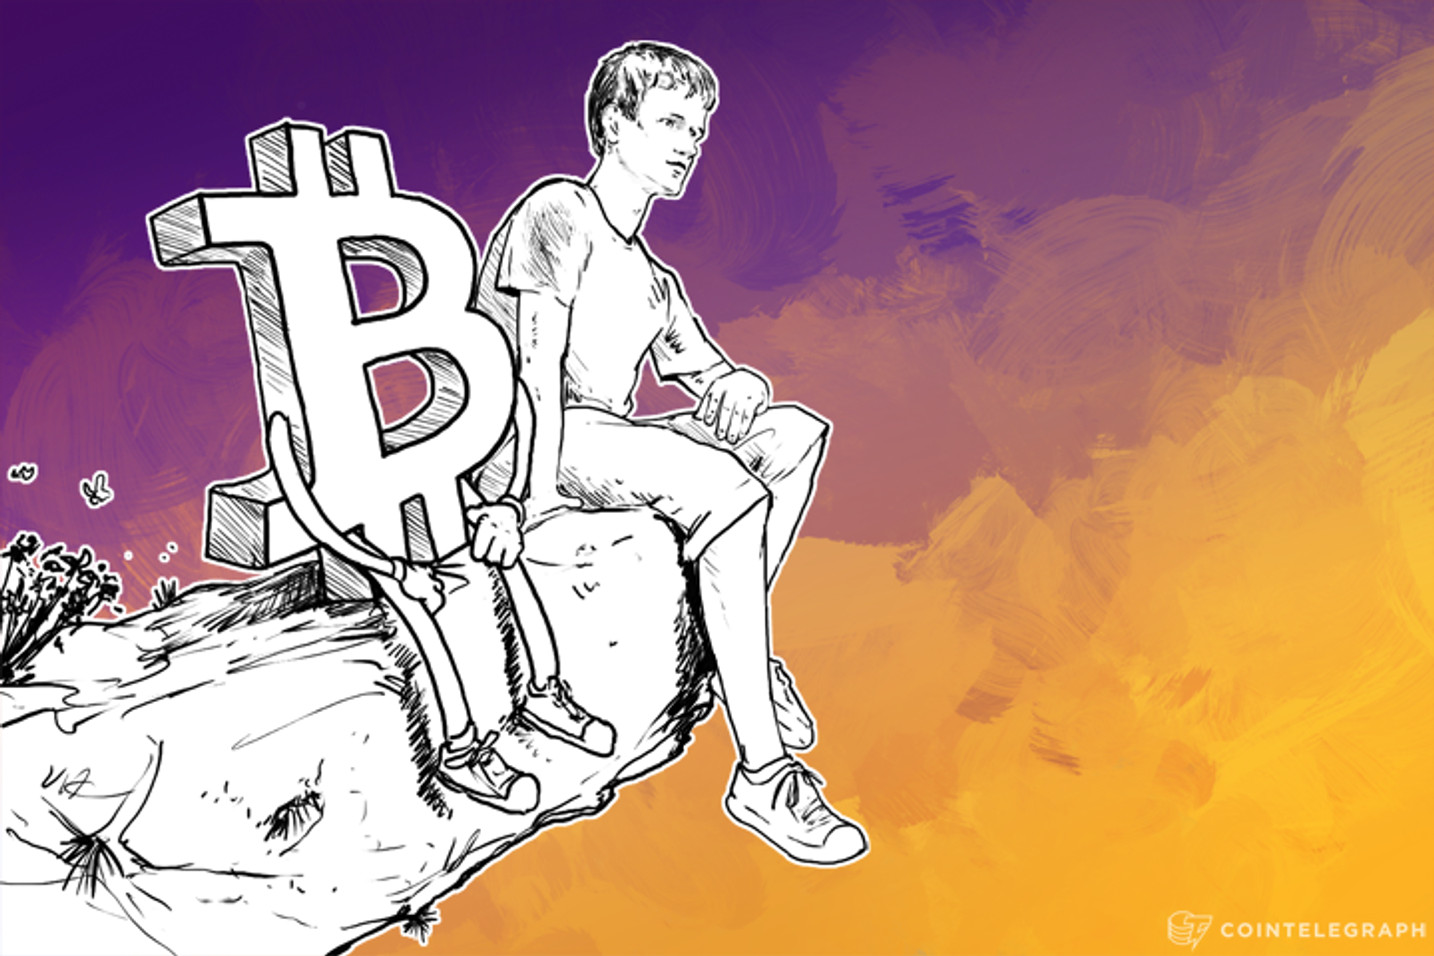 Vitalik Buterin Challenges the Idea of 'Bitcoin Dominance Maximalism' (Op-Ed)